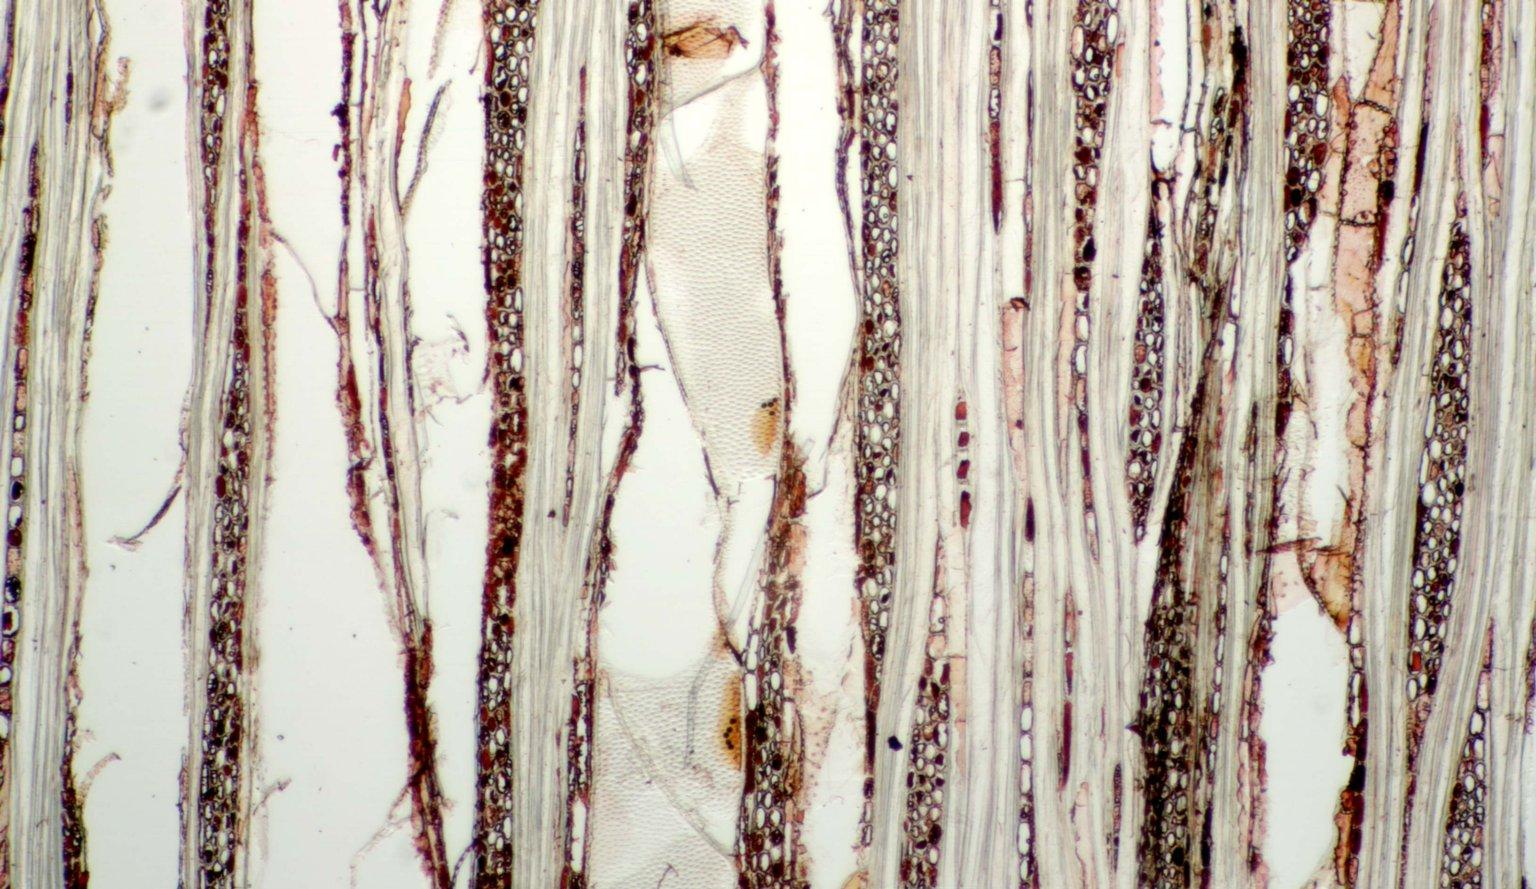 PHYLLANTHACEAE Spondianthus preussii